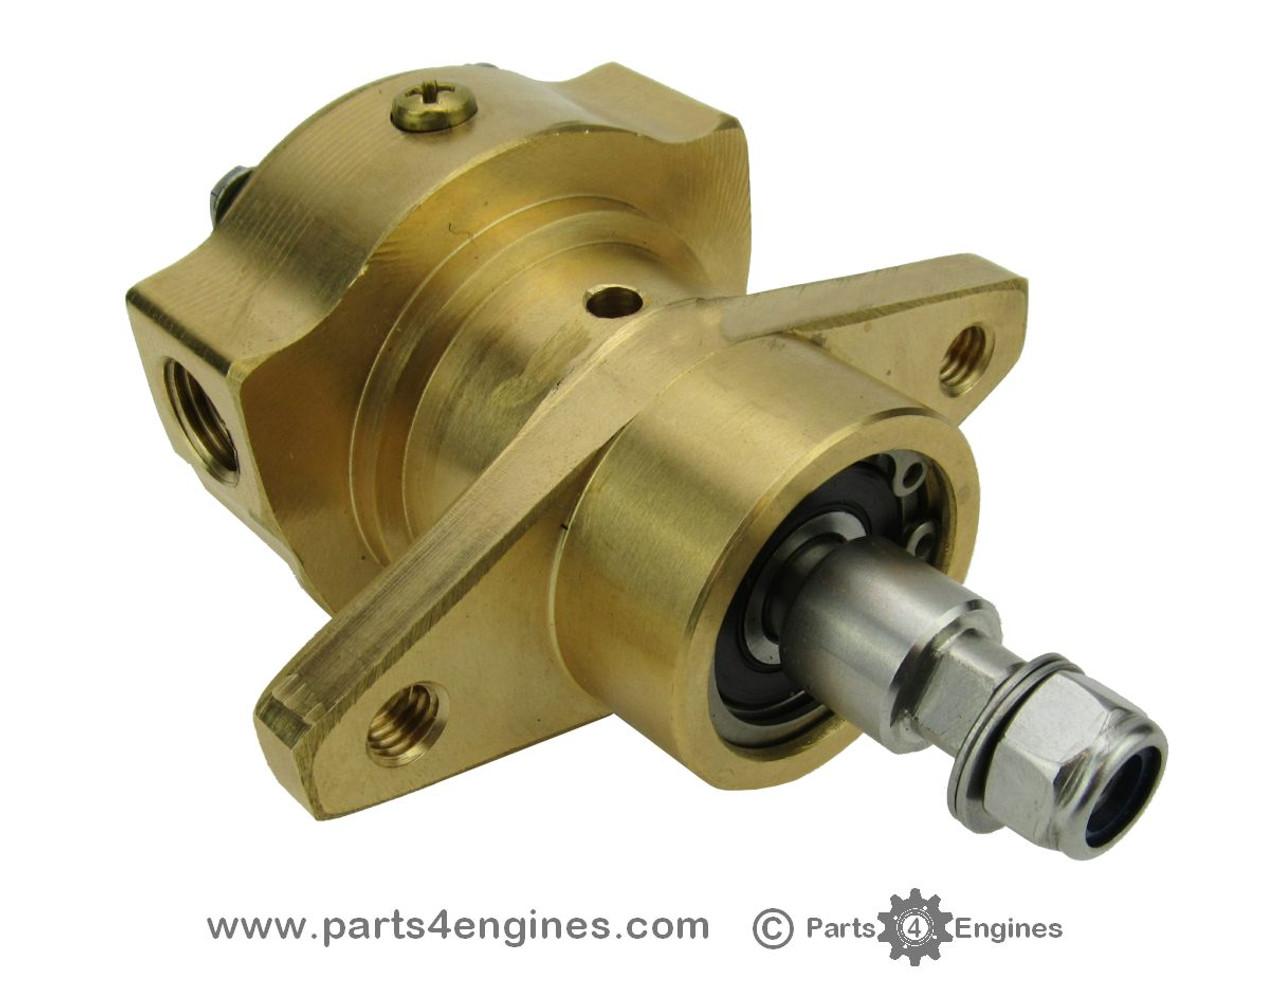 Yanmar 2GM series raw water pump - parts4engines.com